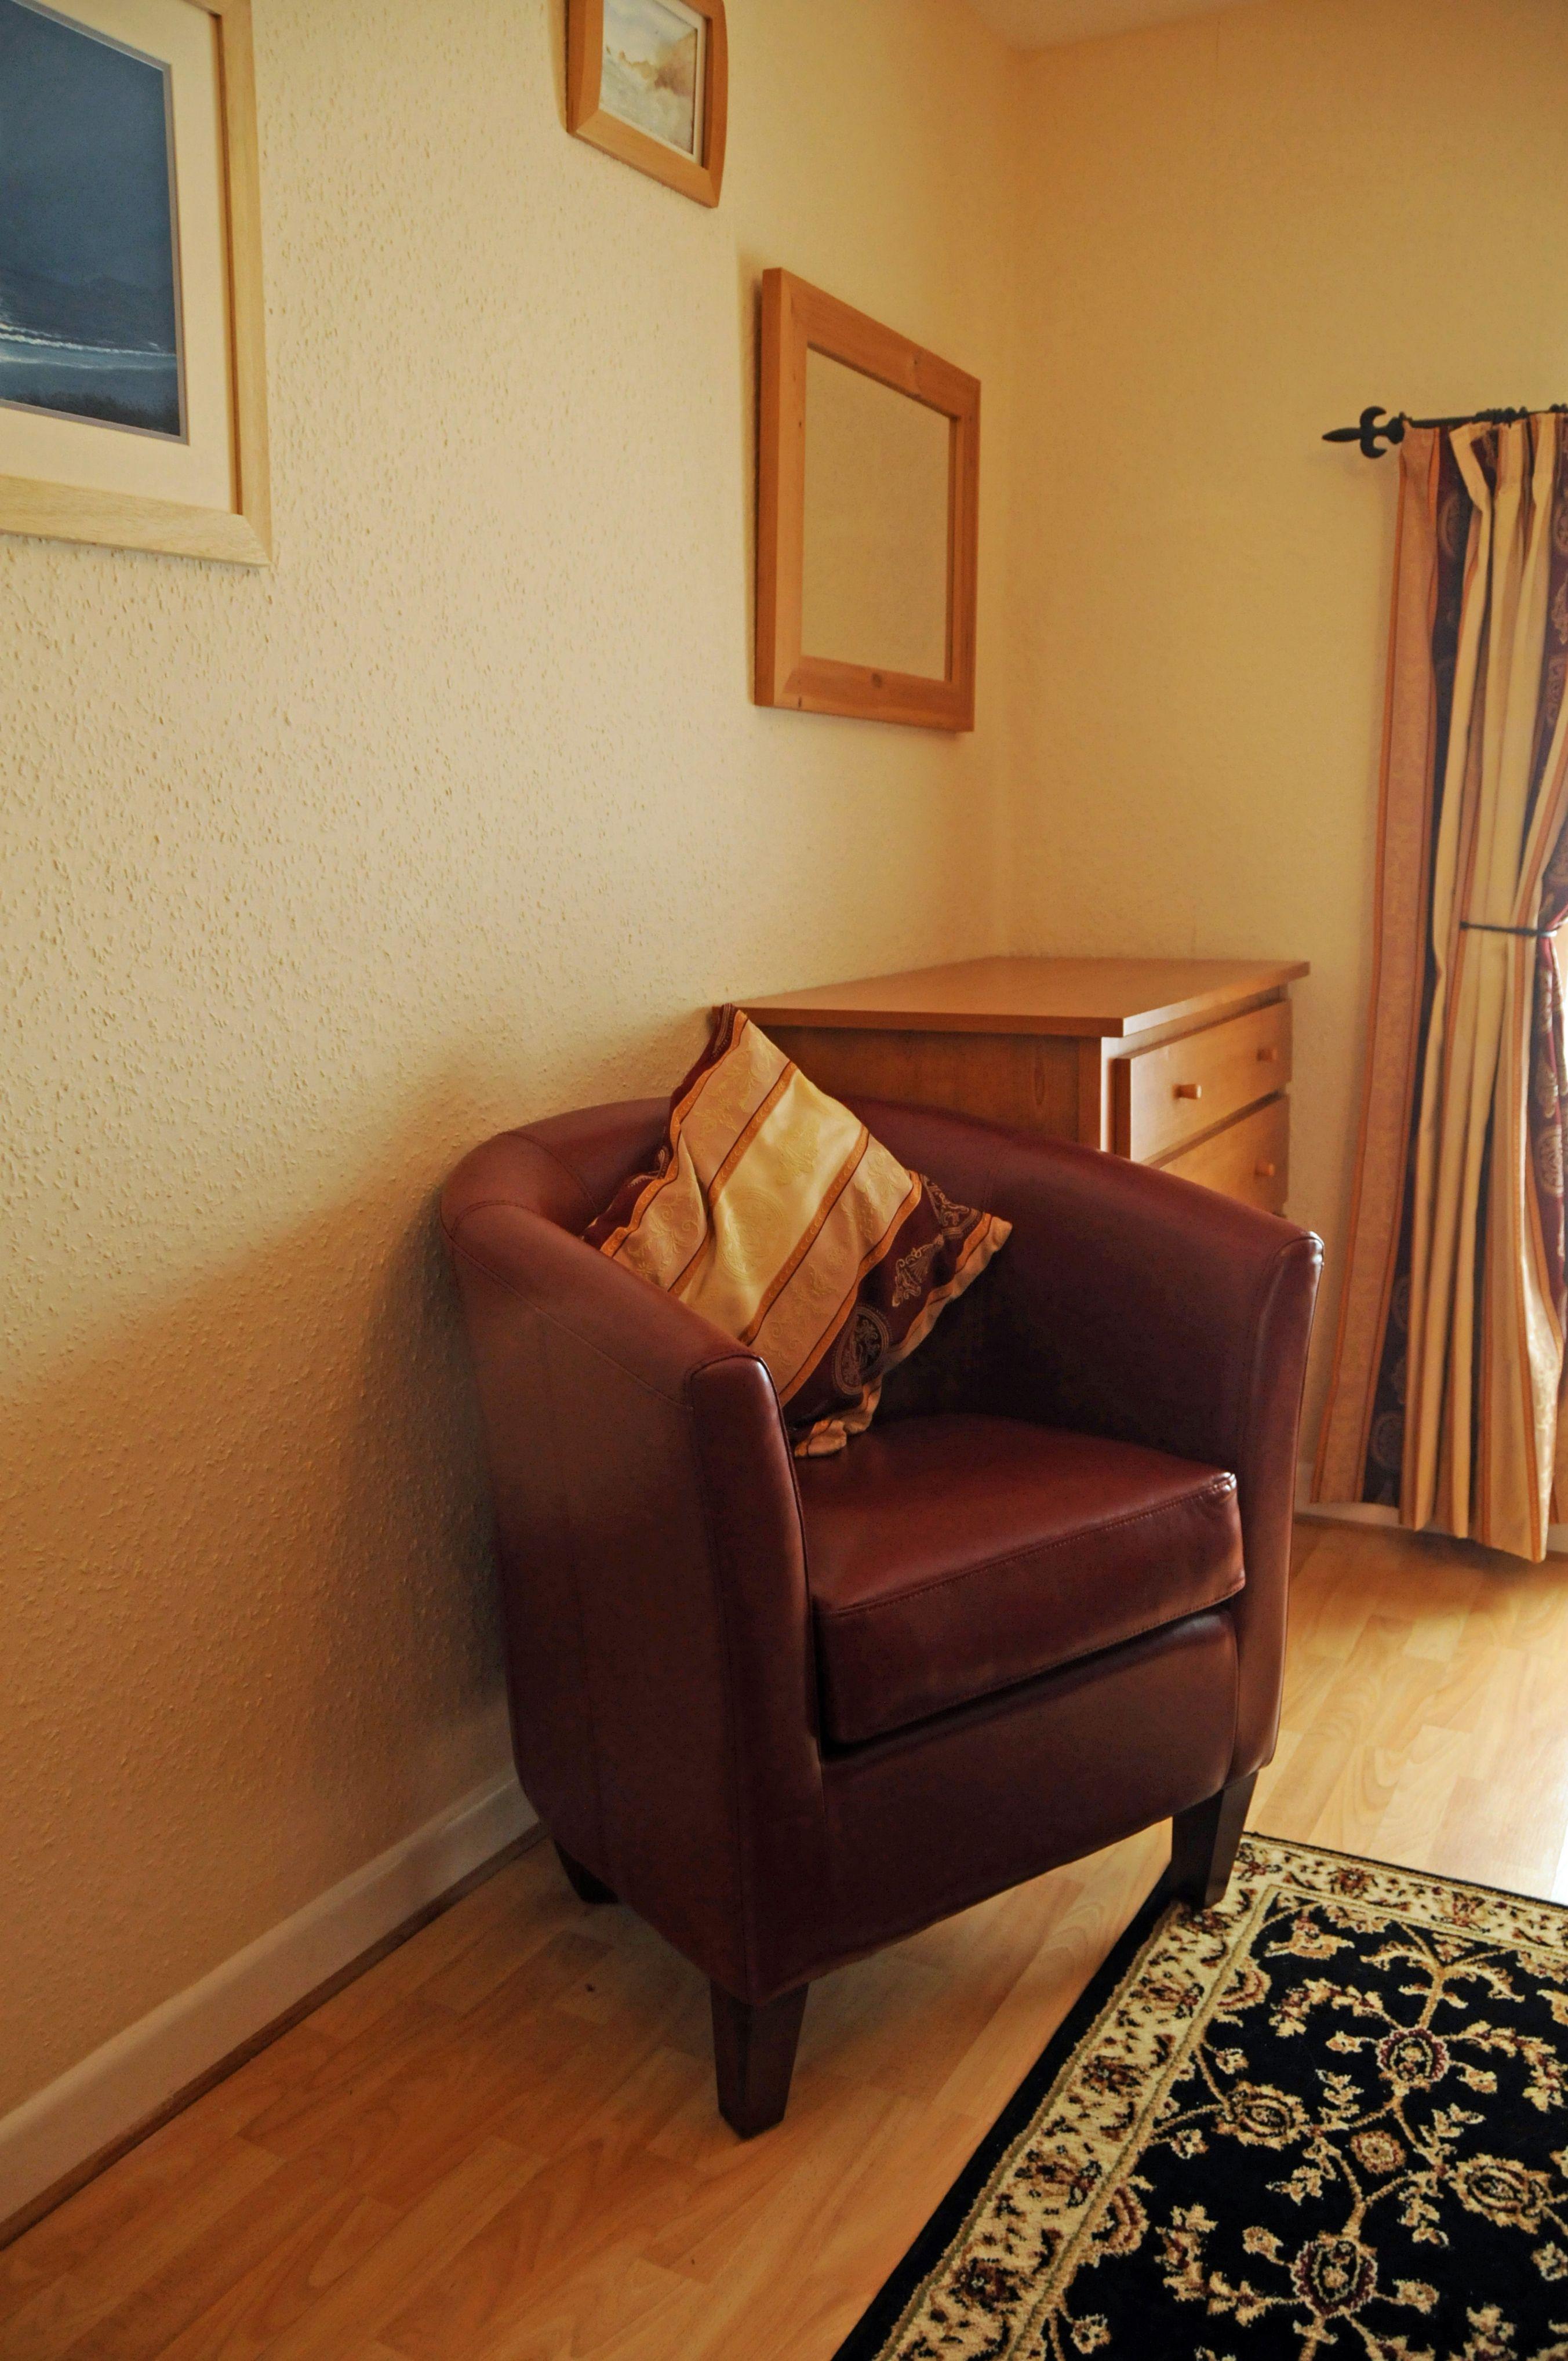 Craigslist Myrtle Beach Furniture Modern Vintage Furniture Check